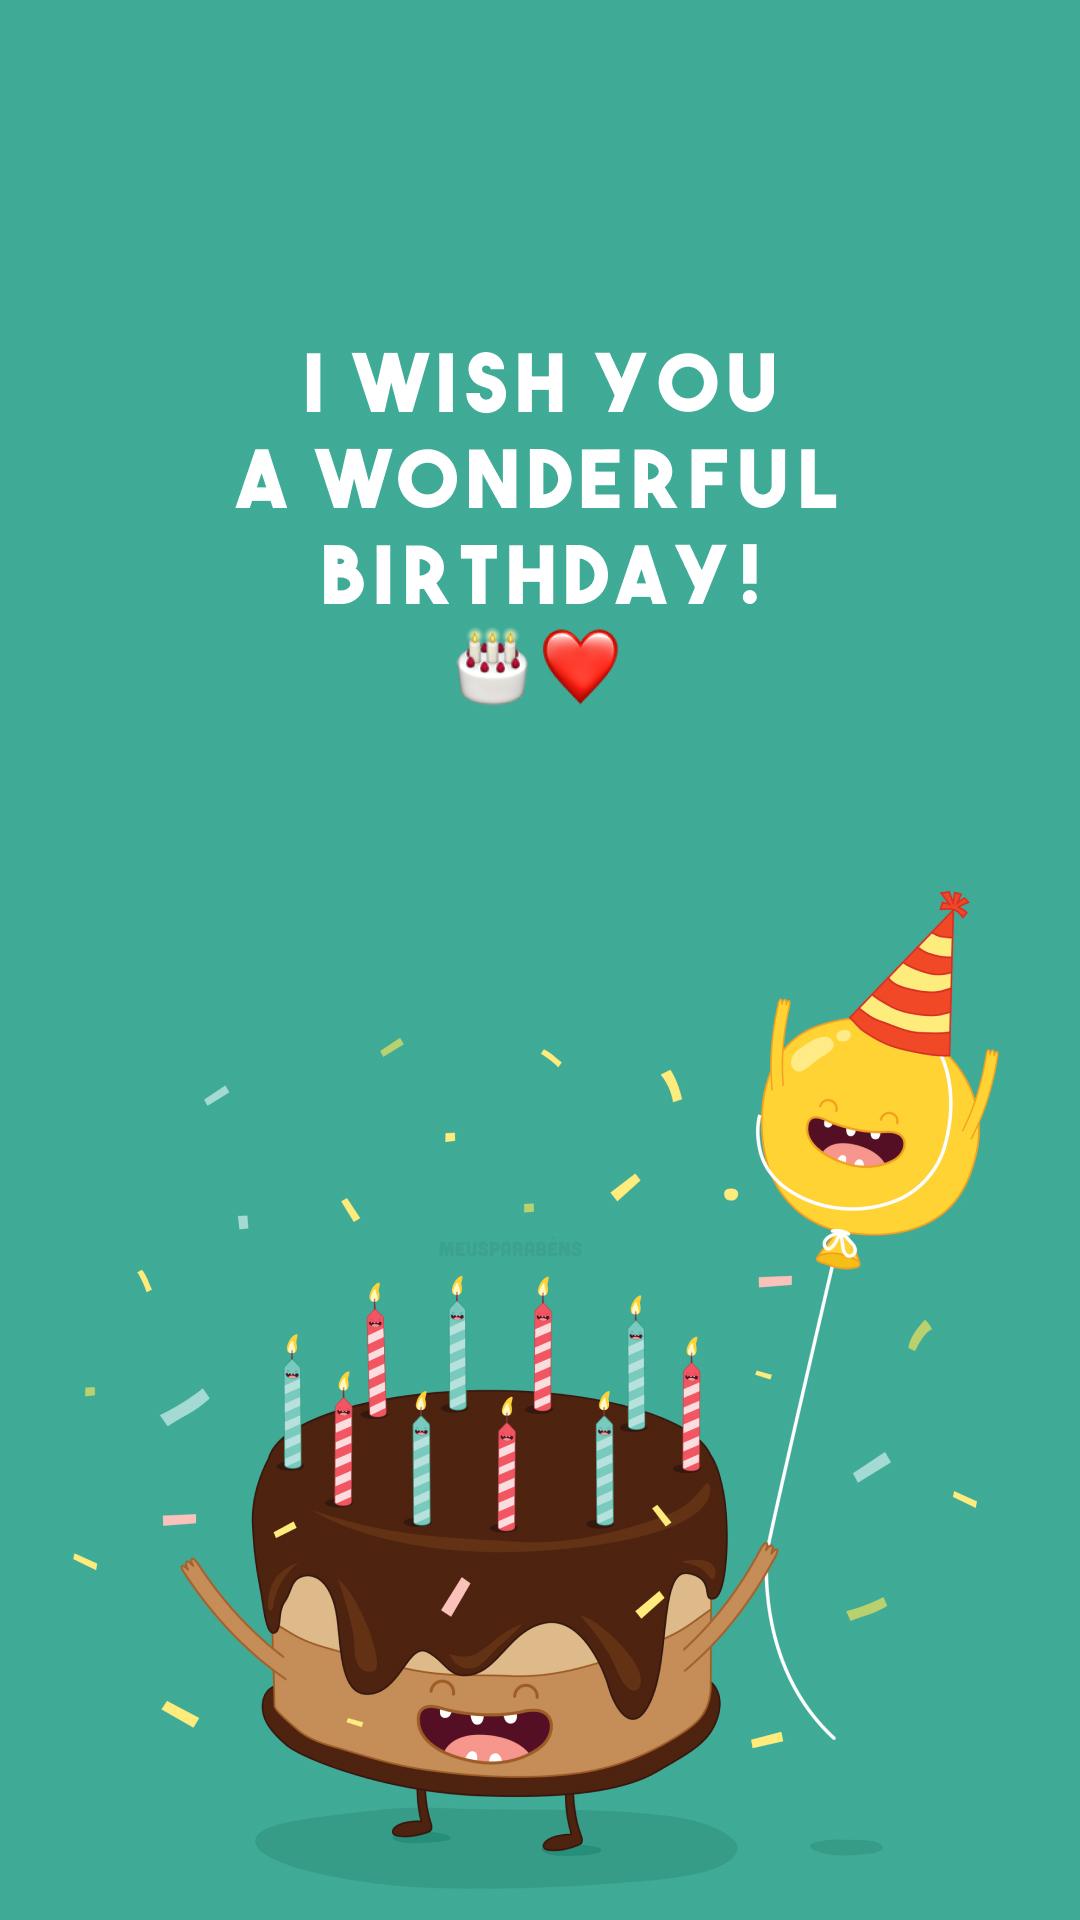 I wish you a wonderful birthday! 🎂❤️ (Desejo a você um maravilhoso aniversário!)